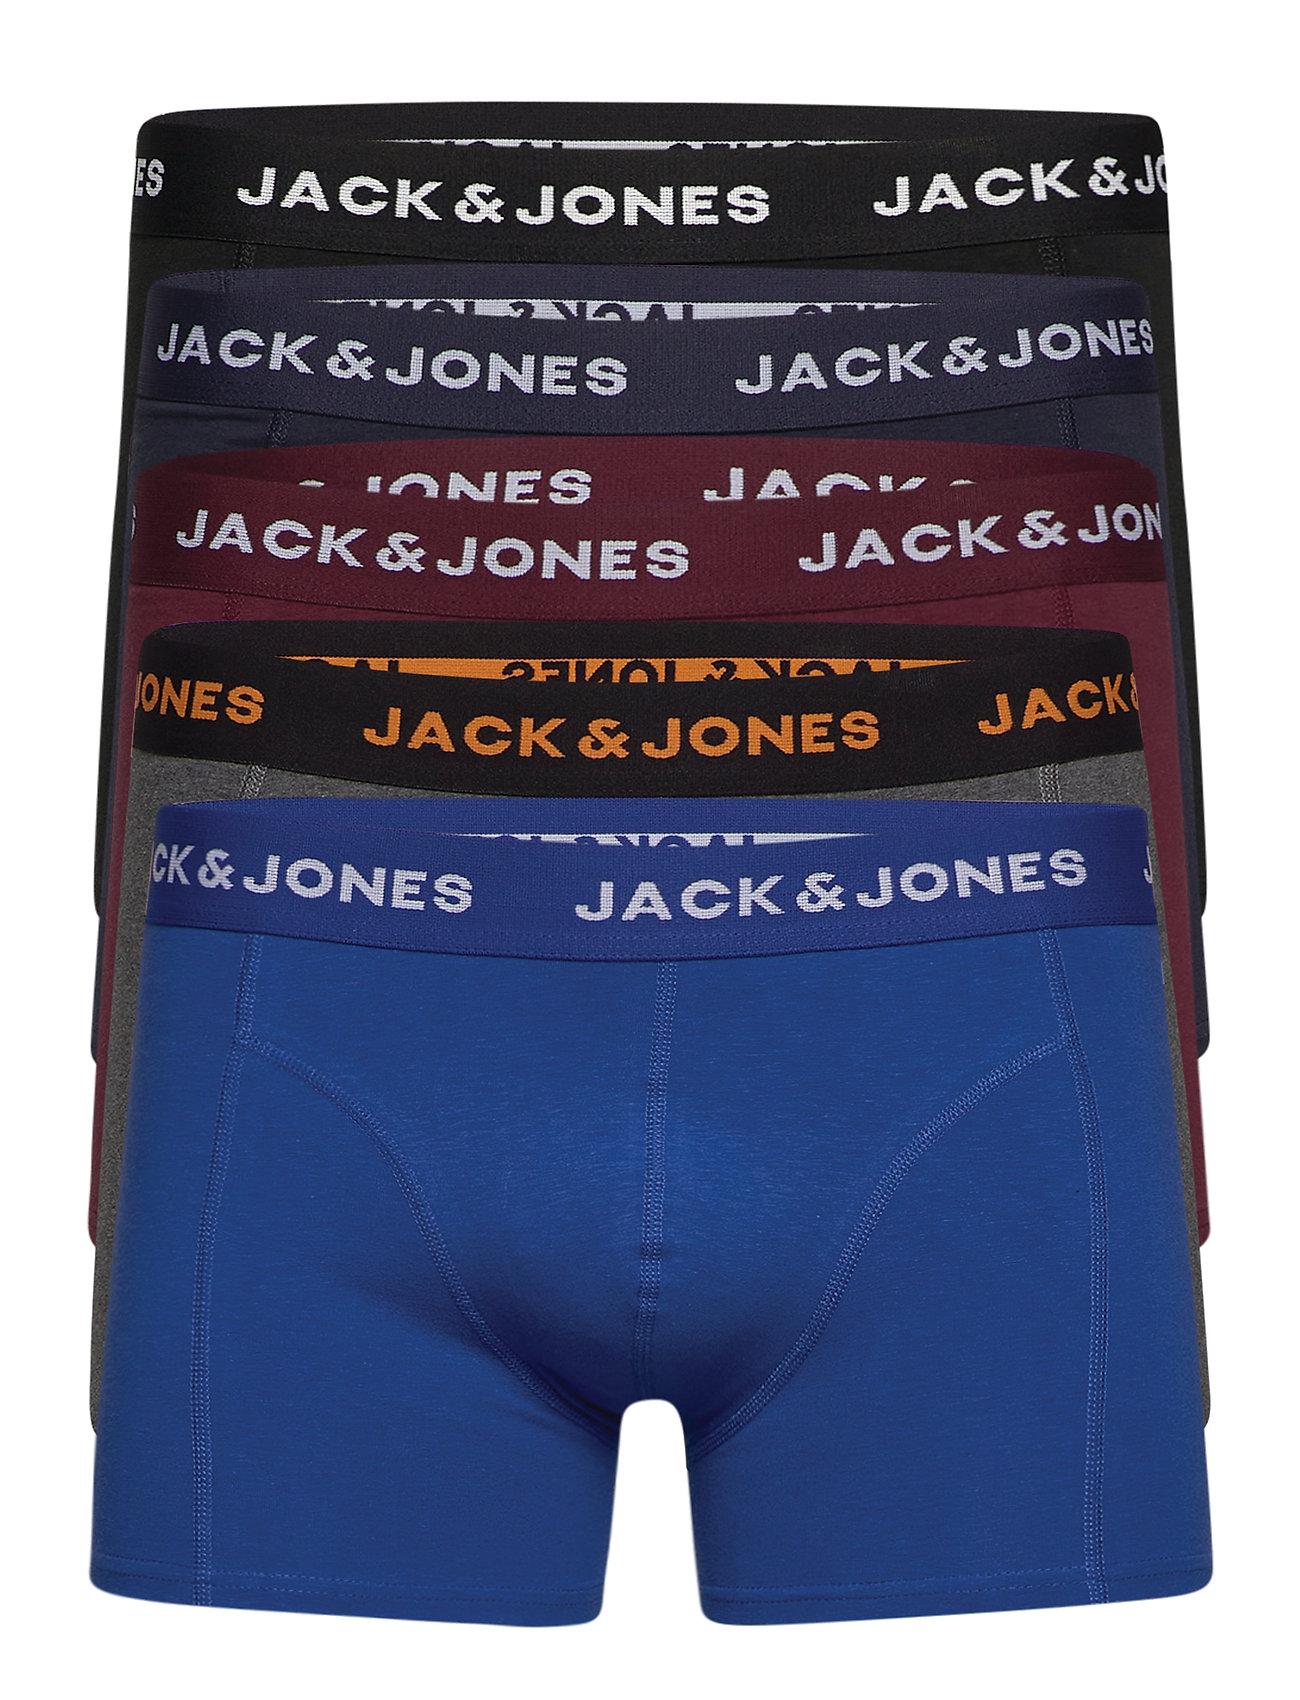 Image of Jacblack Friday Trunks 5 Pack Ltn Boxershorts Multi/mønstret Jack & J S (3462700659)